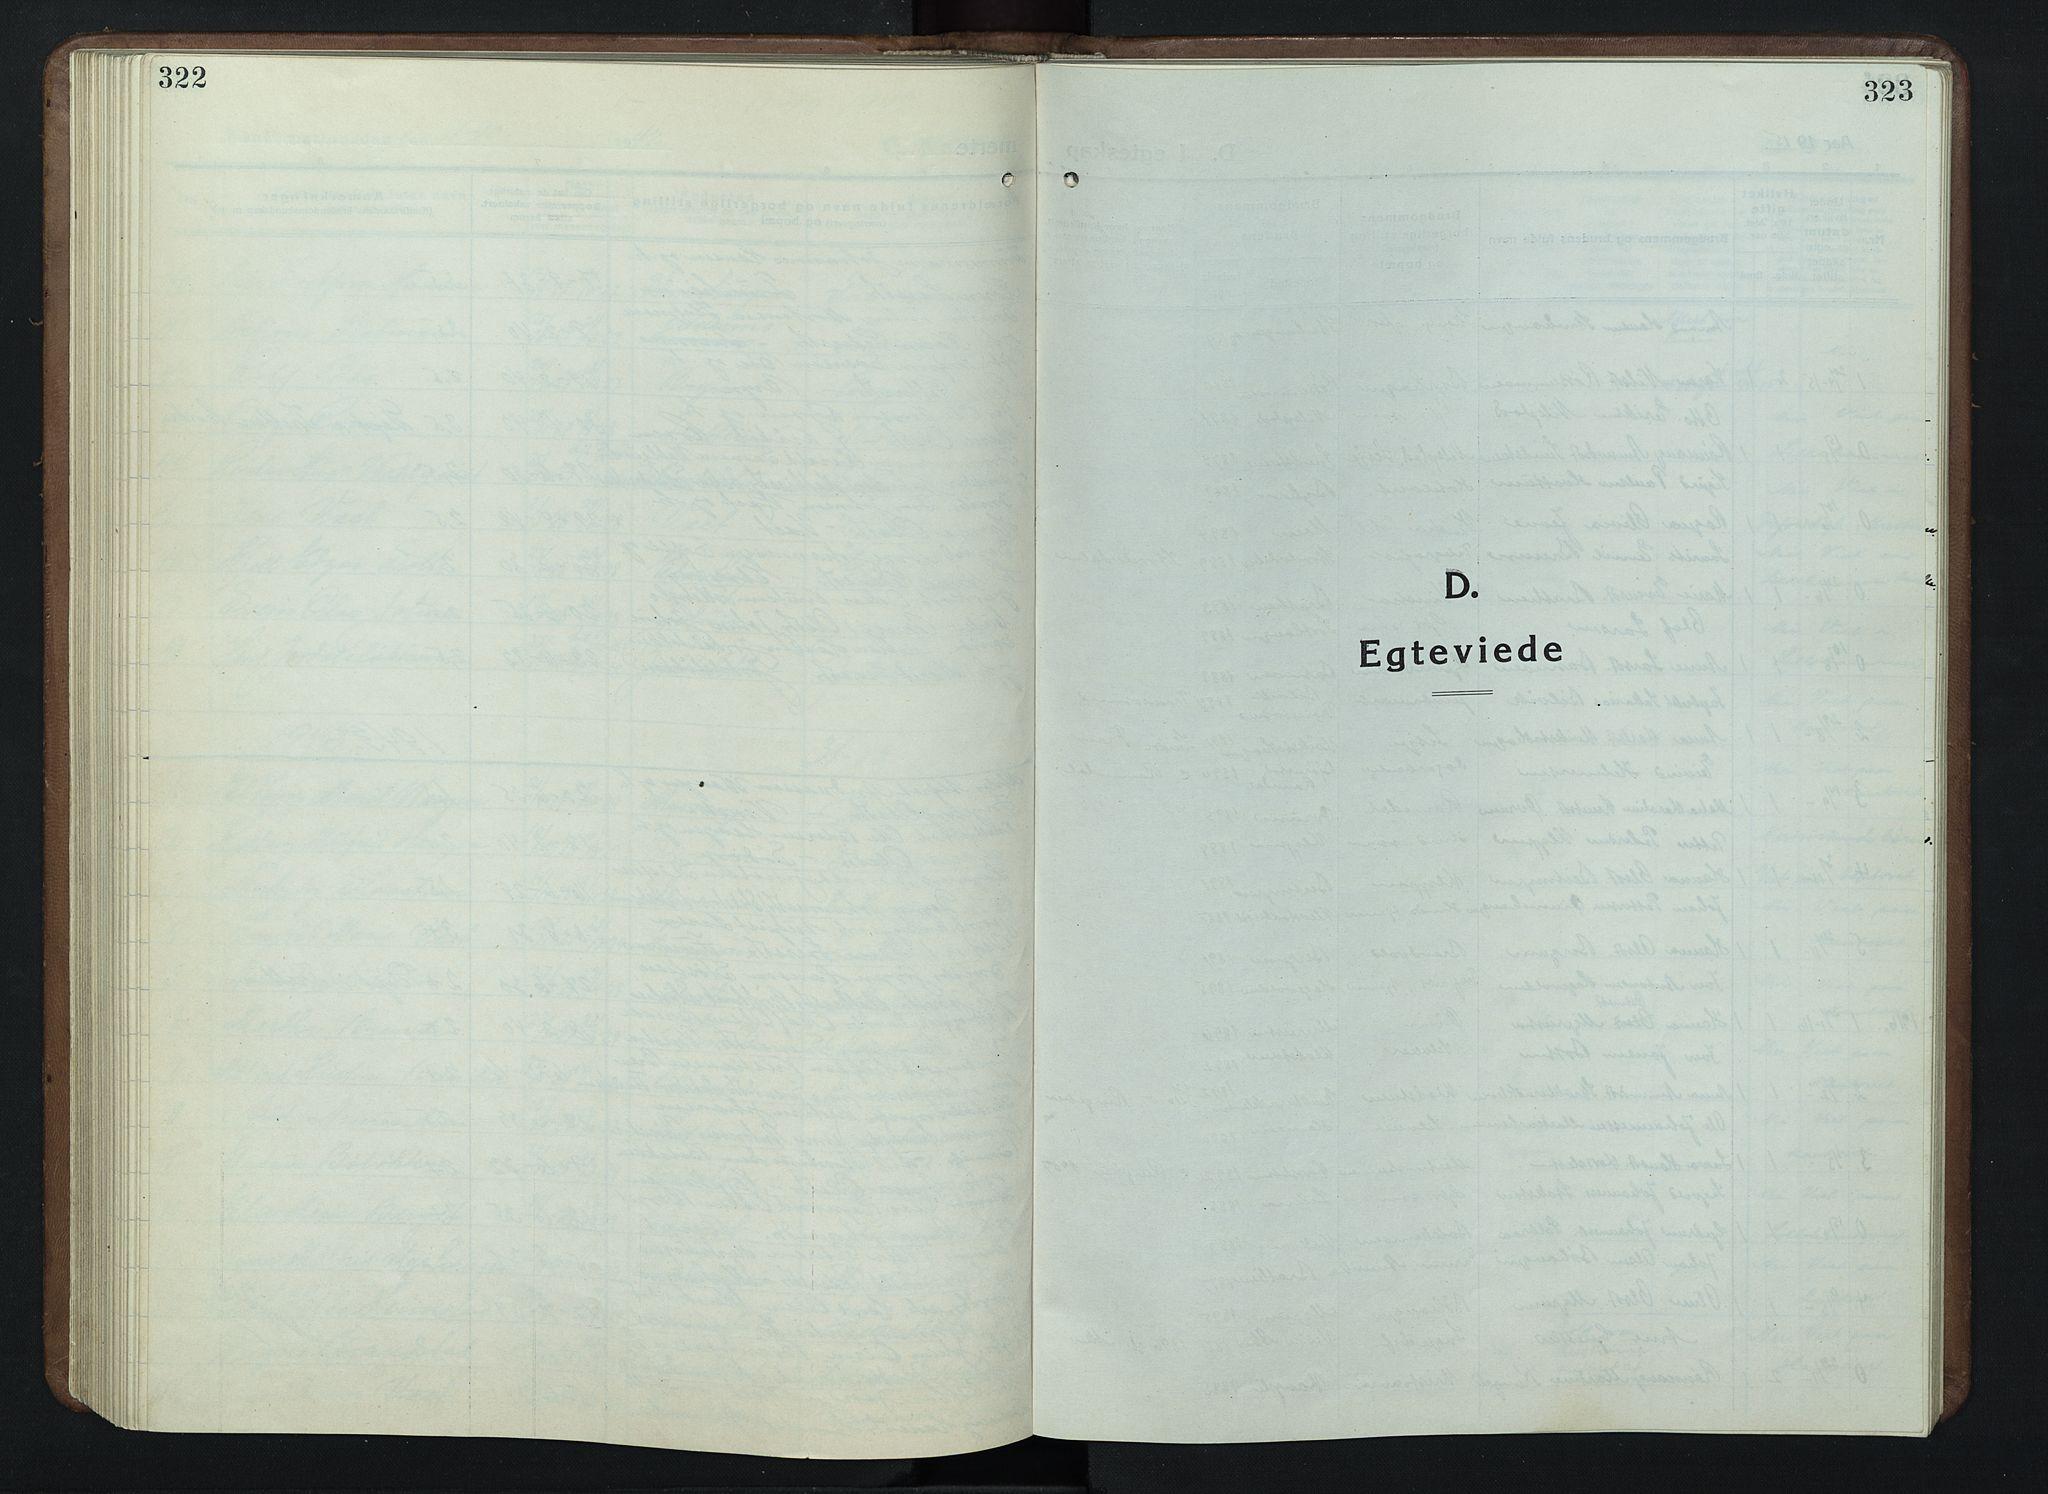 SAH, Nord-Fron prestekontor, Klokkerbok nr. 7, 1915-1946, s. 322-323